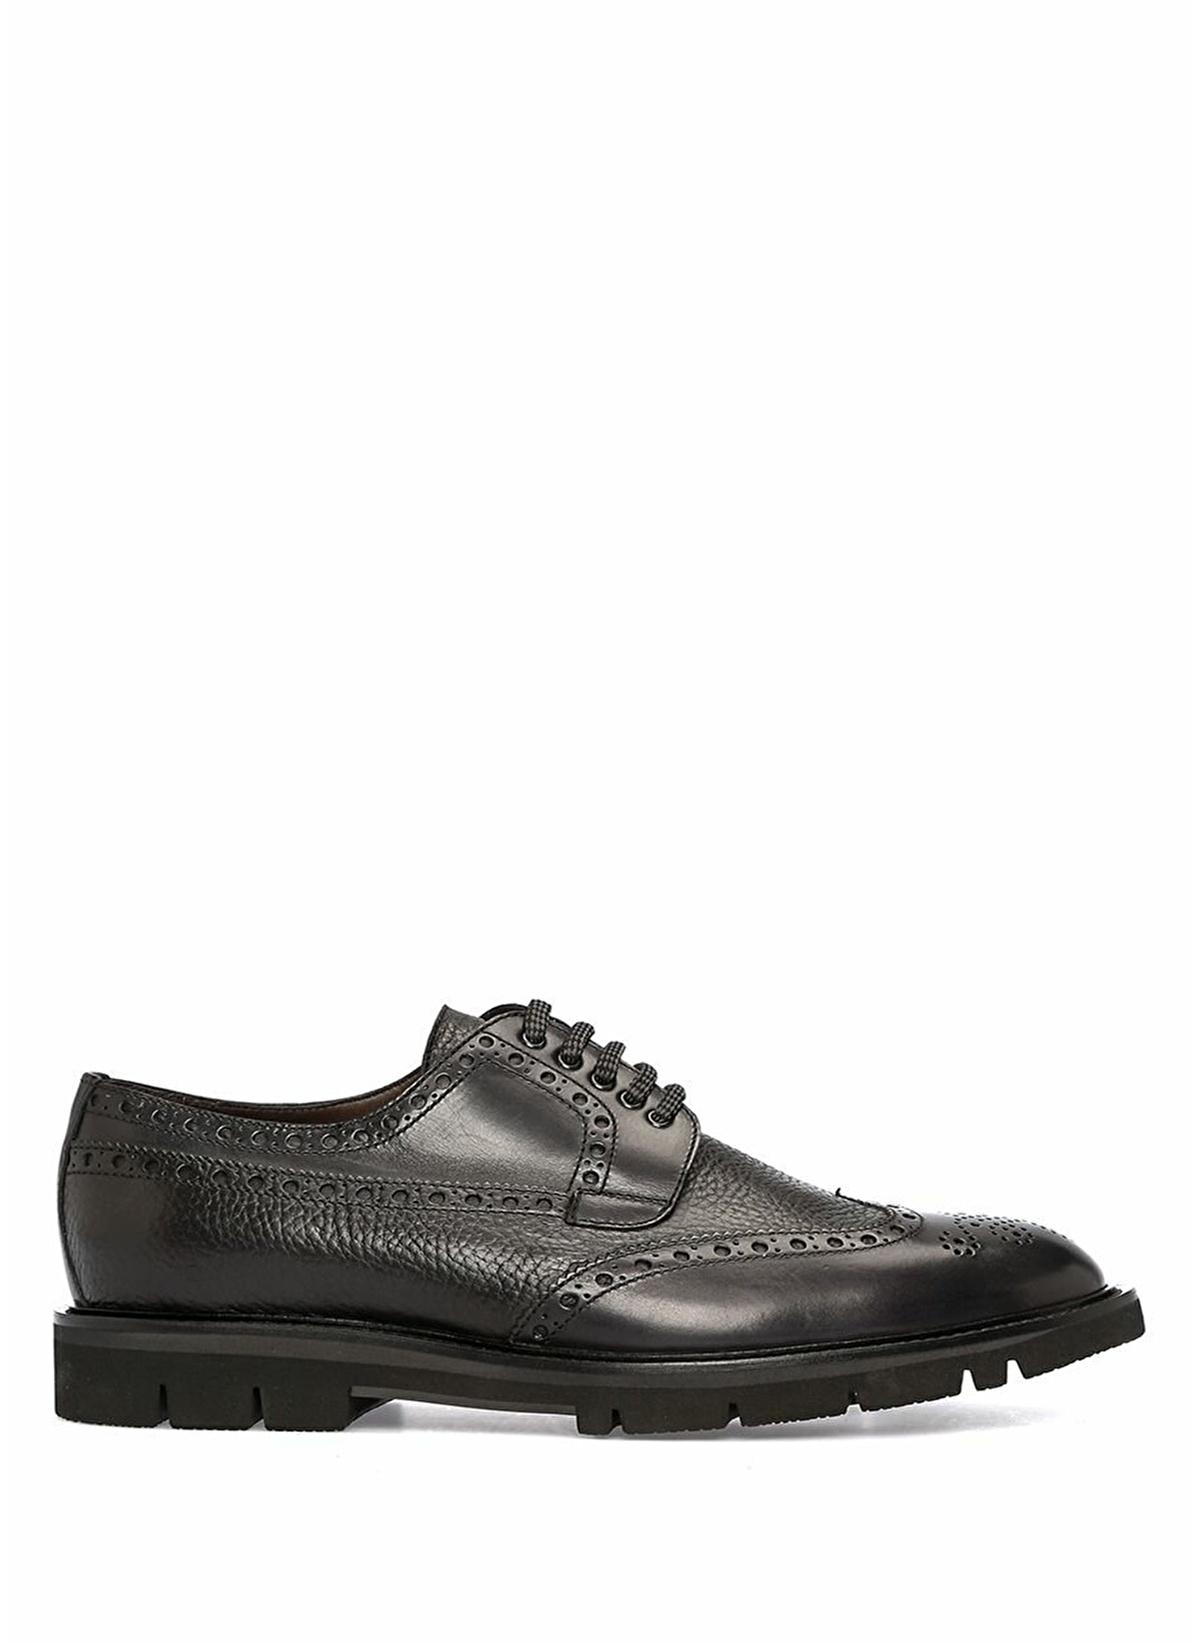 Barrett Deri Oxford Ayakkabı 1887.0 Tl